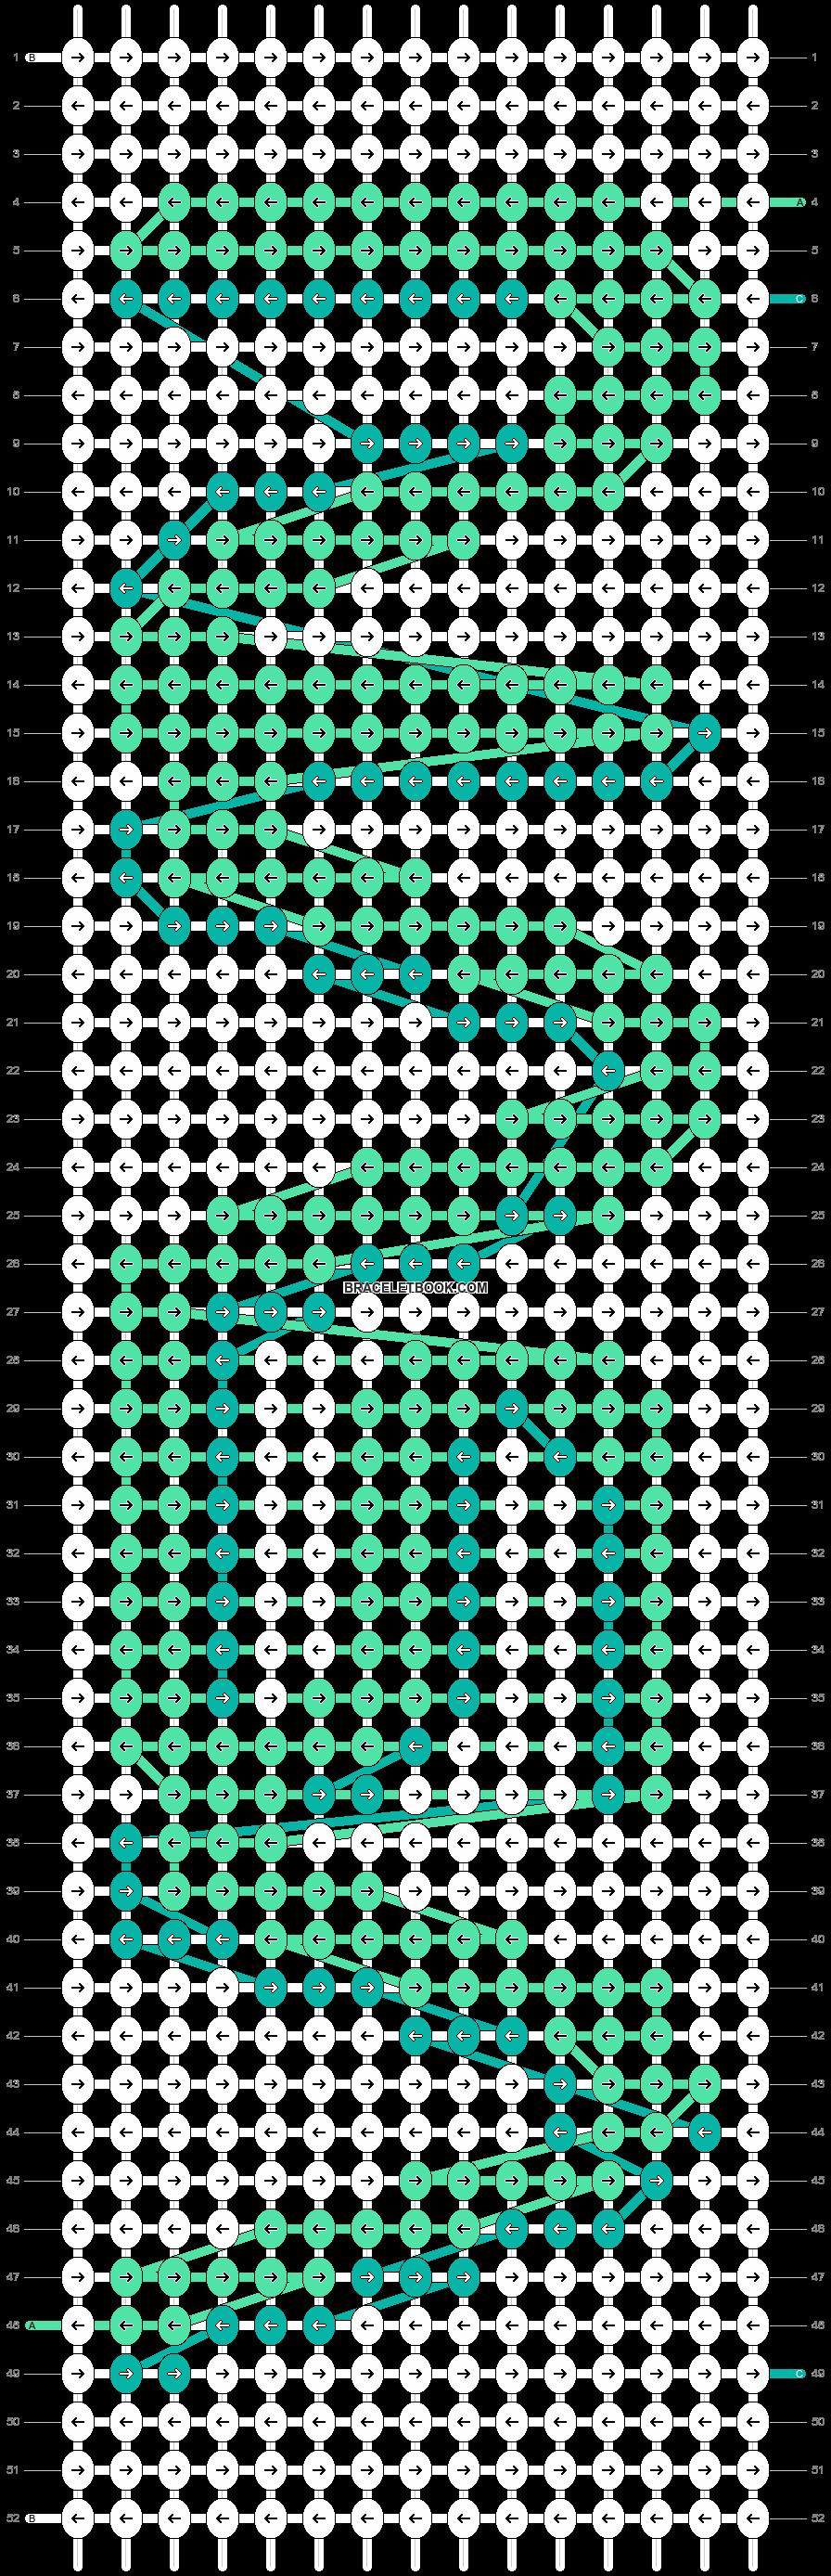 Alpha pattern #57624 variation #101345 pattern